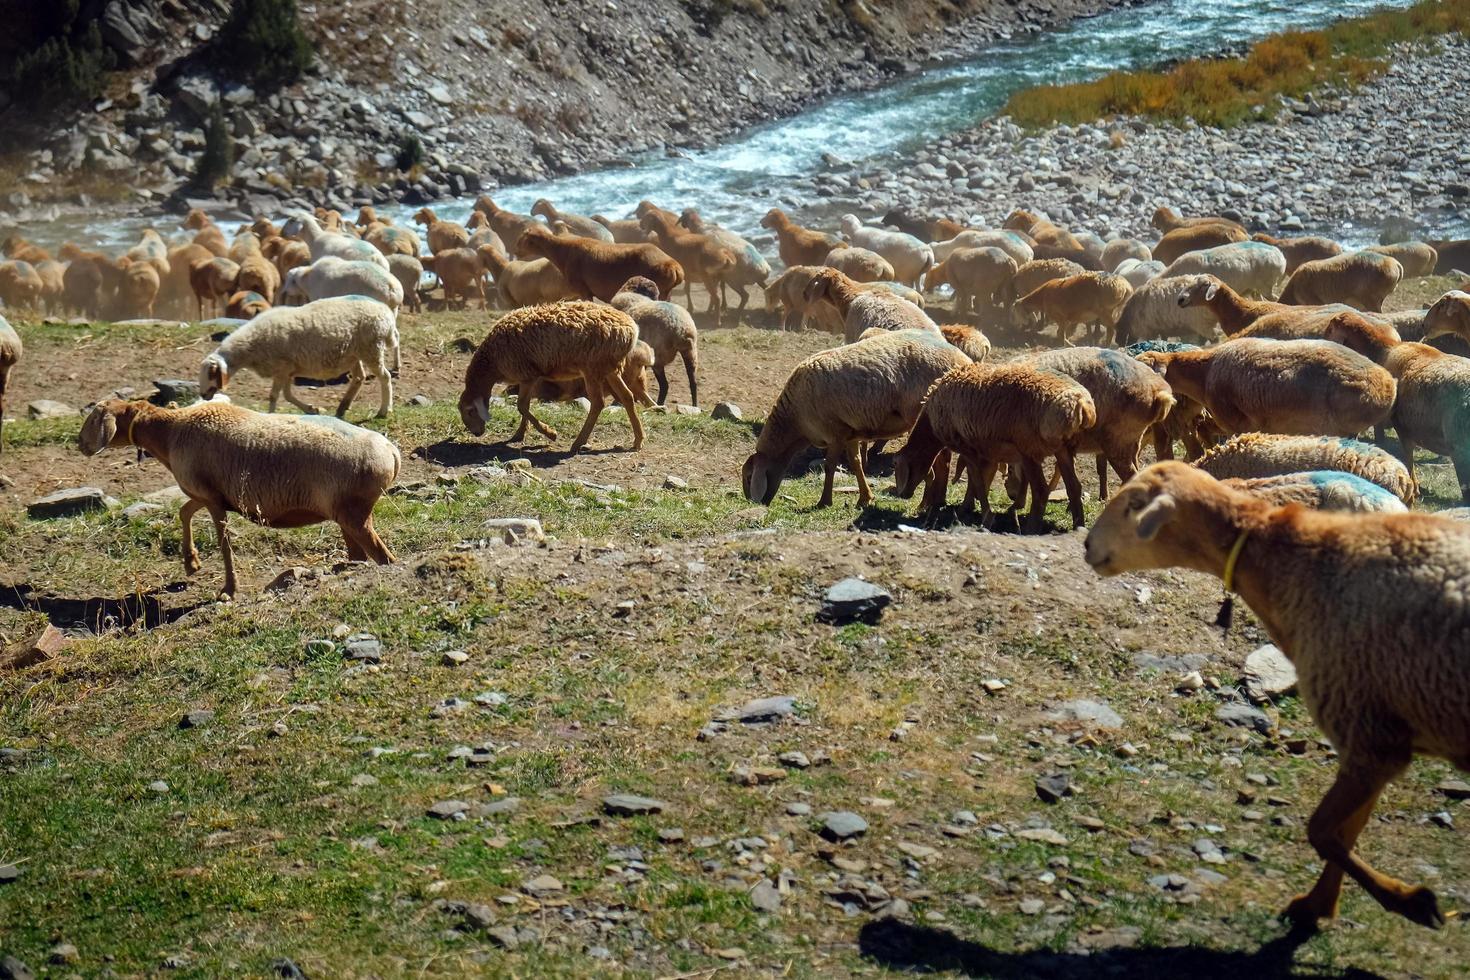 Herde lokaler Schafe, die in der Nähe des Flusses weiden foto